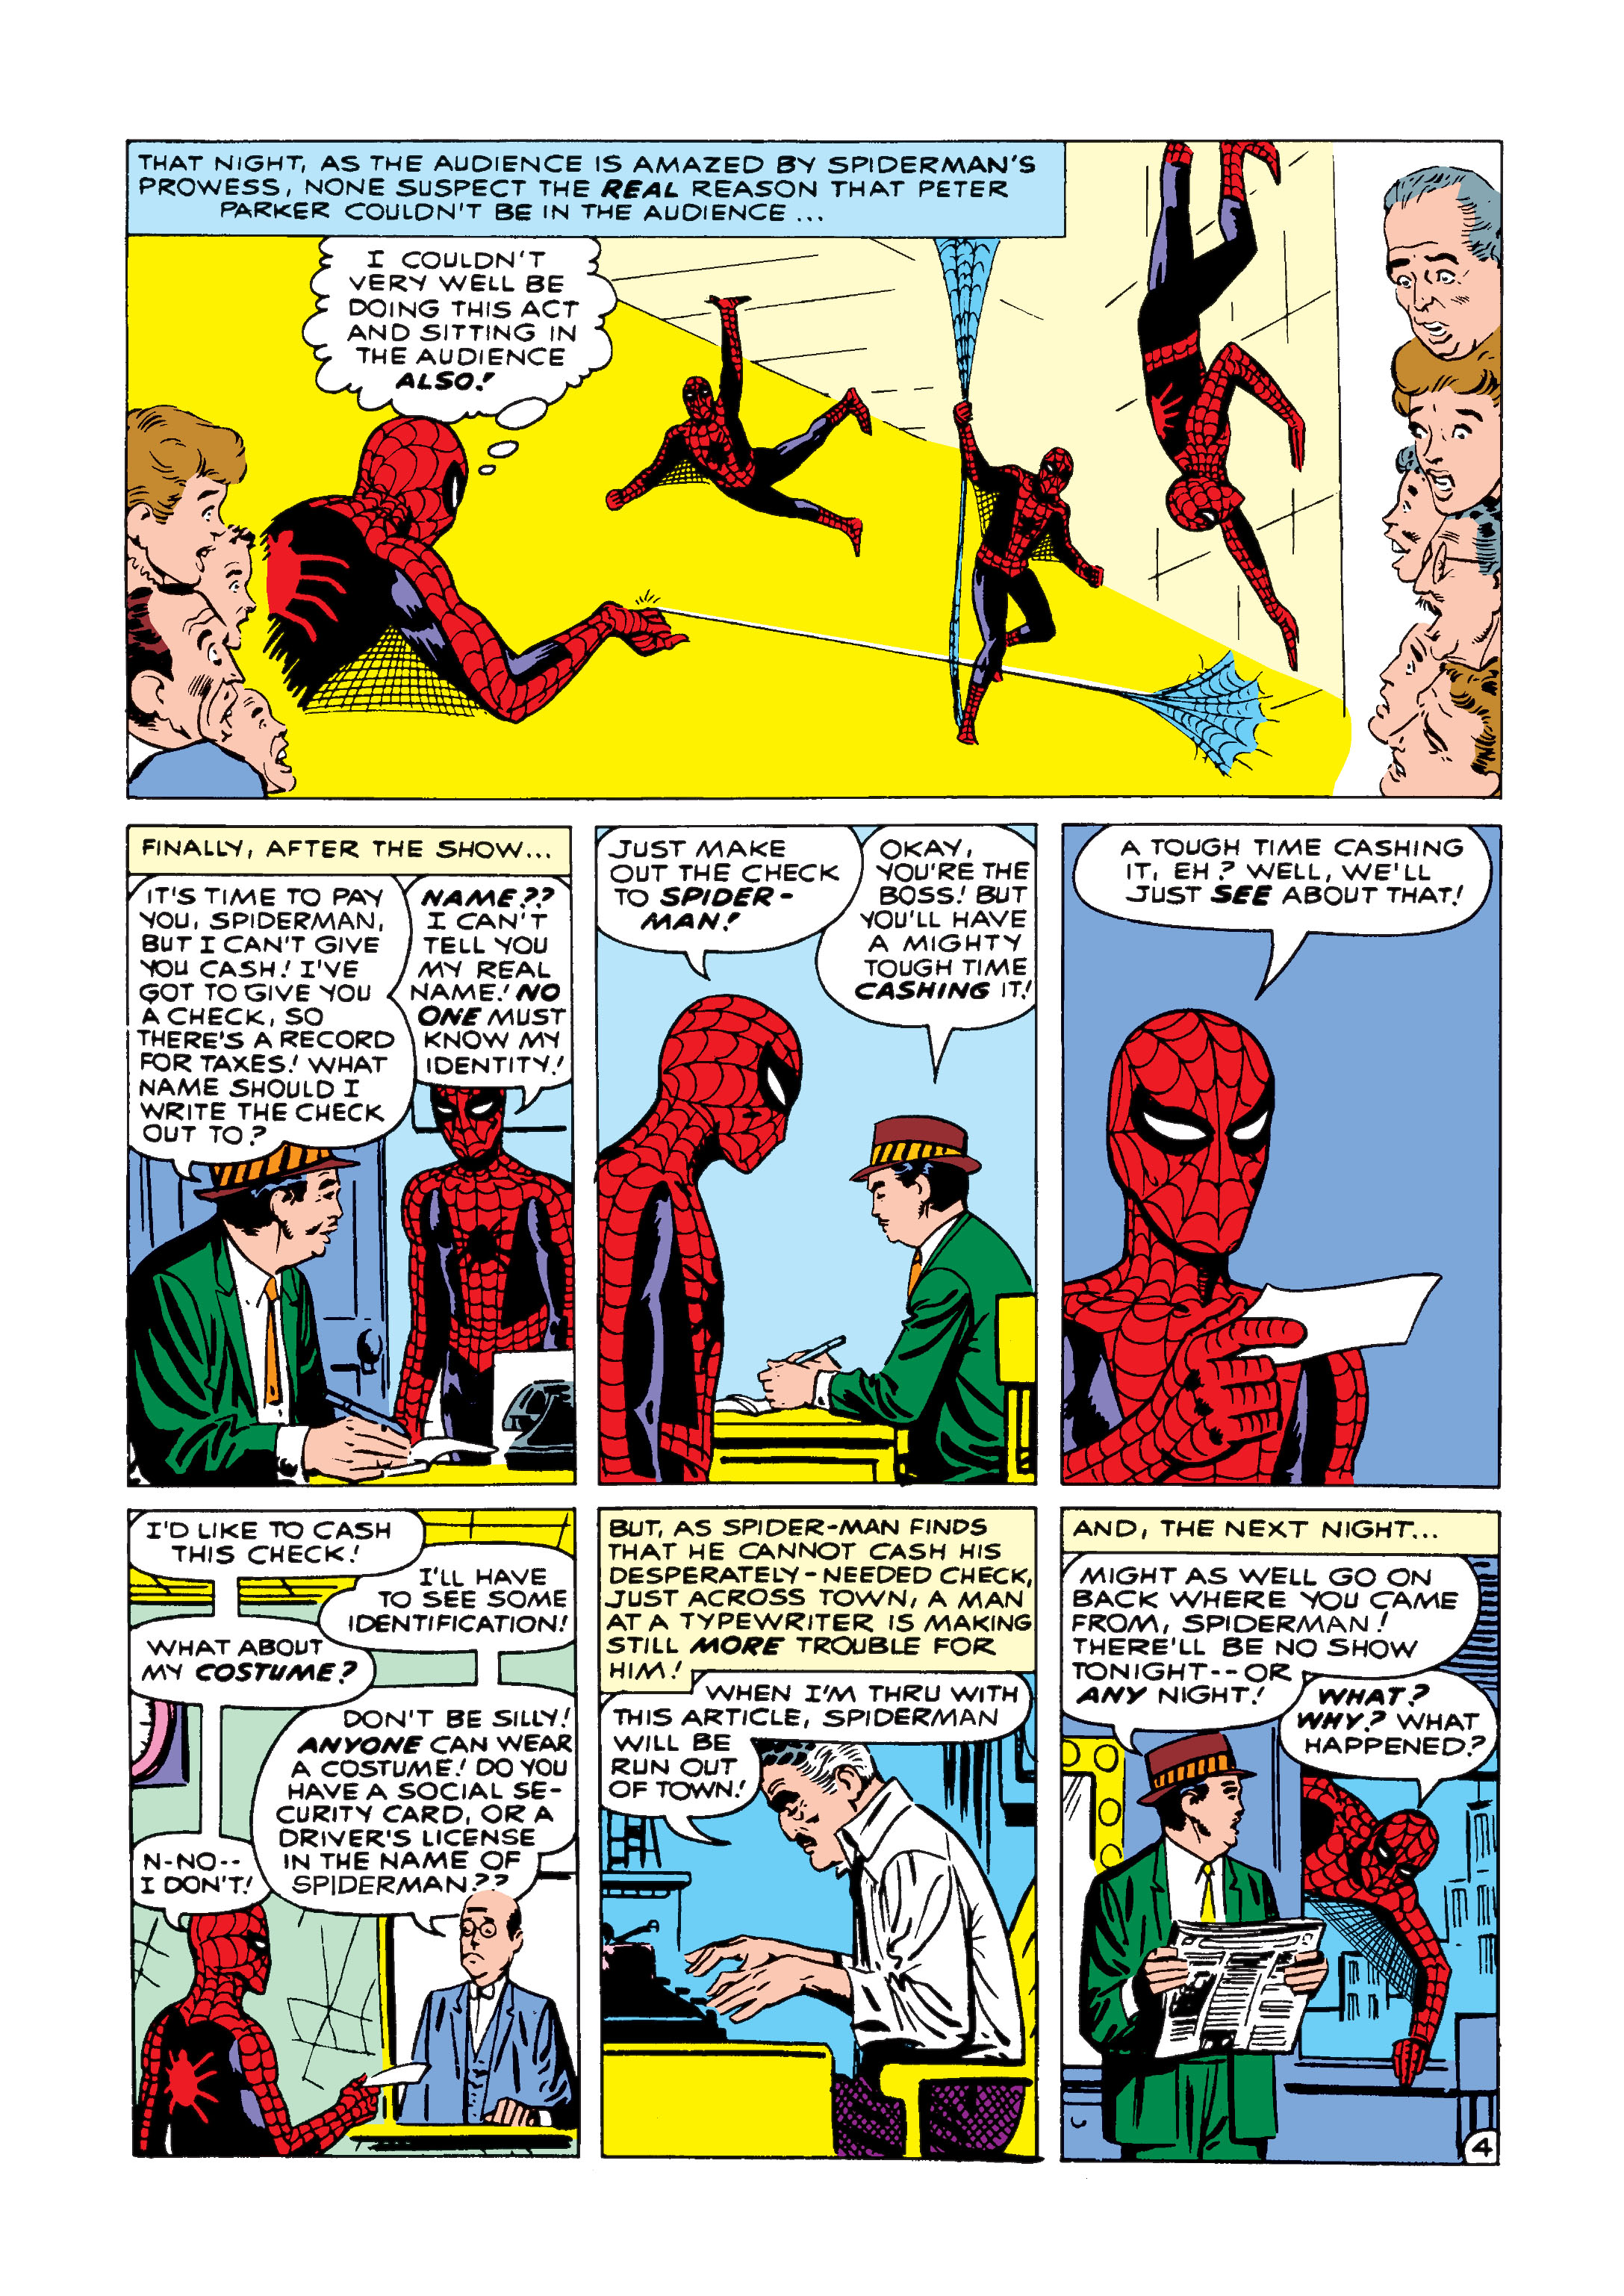 Spider-Man Character Study ― The Ultimate Essay Ji86_JdkZAwjPIkGbCWGmuUnYlmIrZA2Li2o1ZRIwgxtZXFzcjDgKqCjN_i8mk4li4-7eQZLKrEp=s0